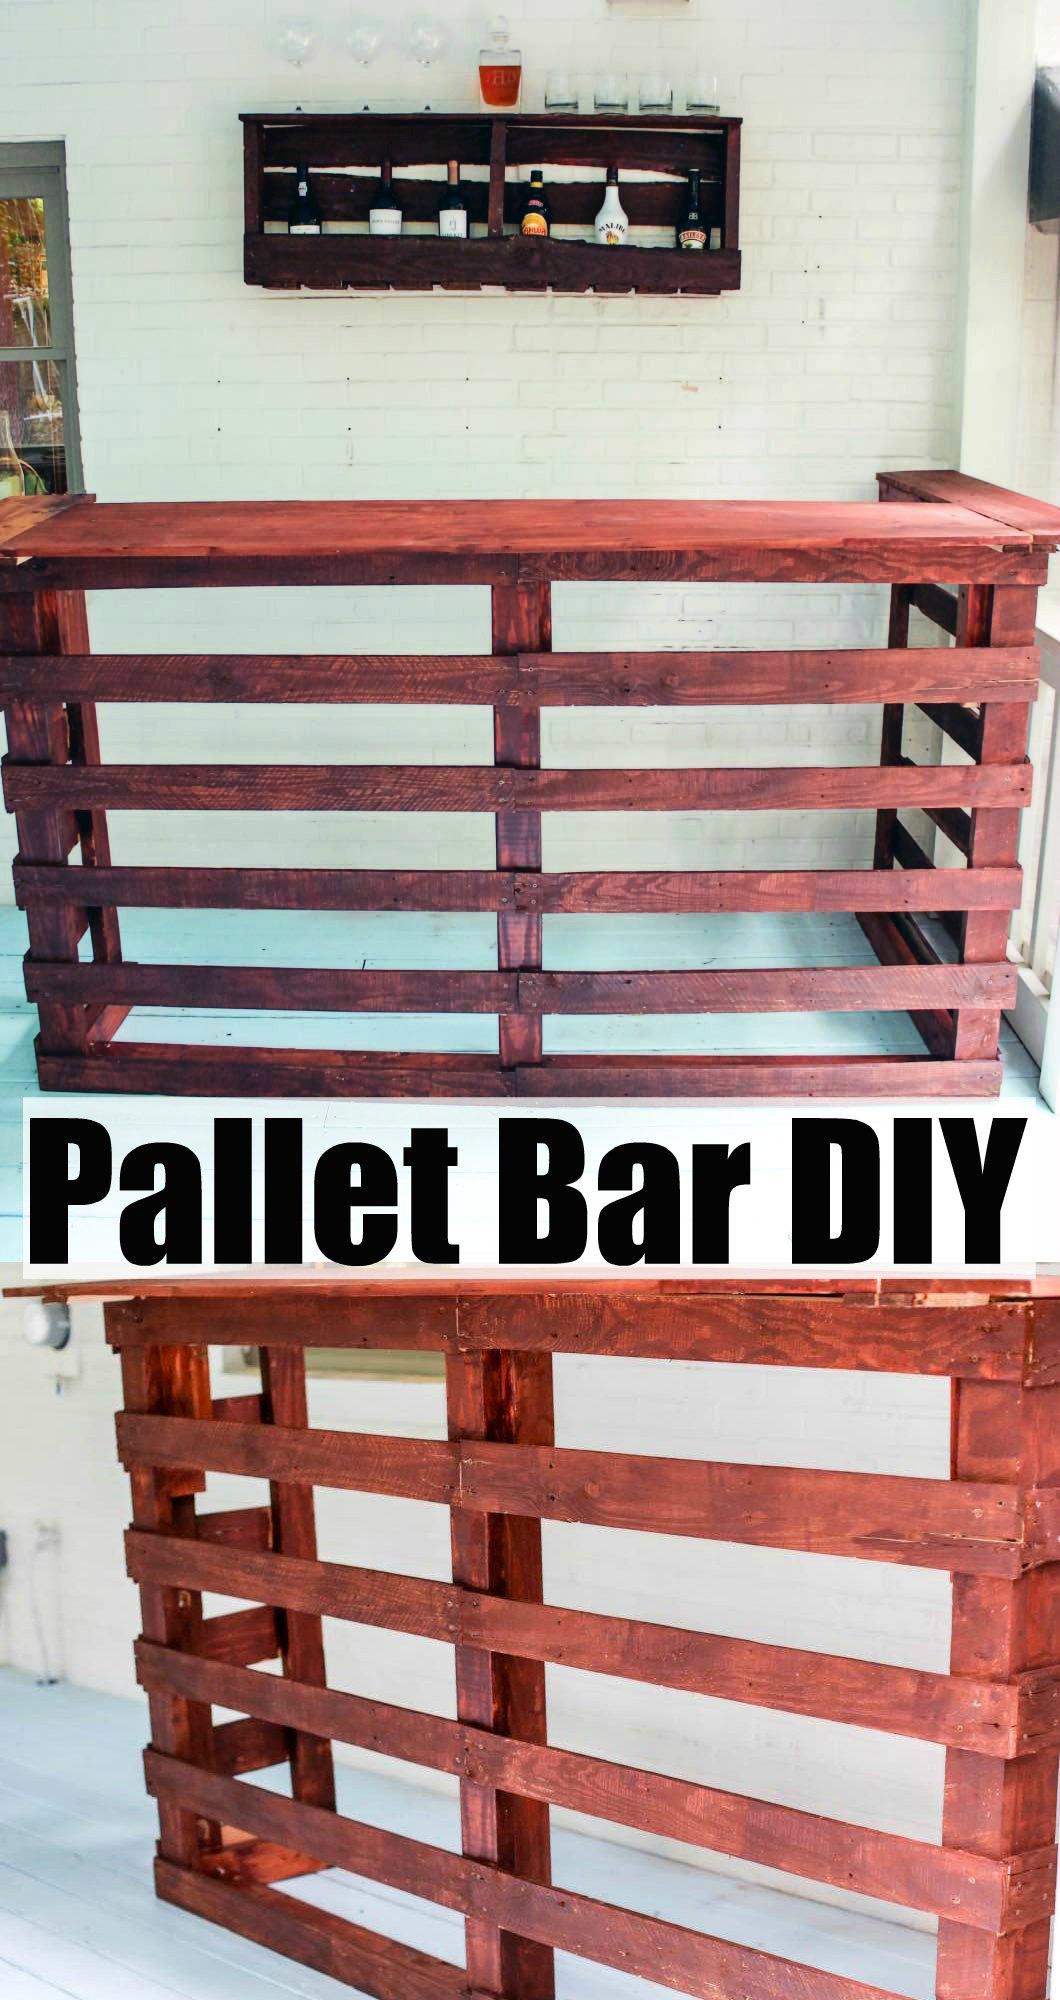 Pallet Bar DIY